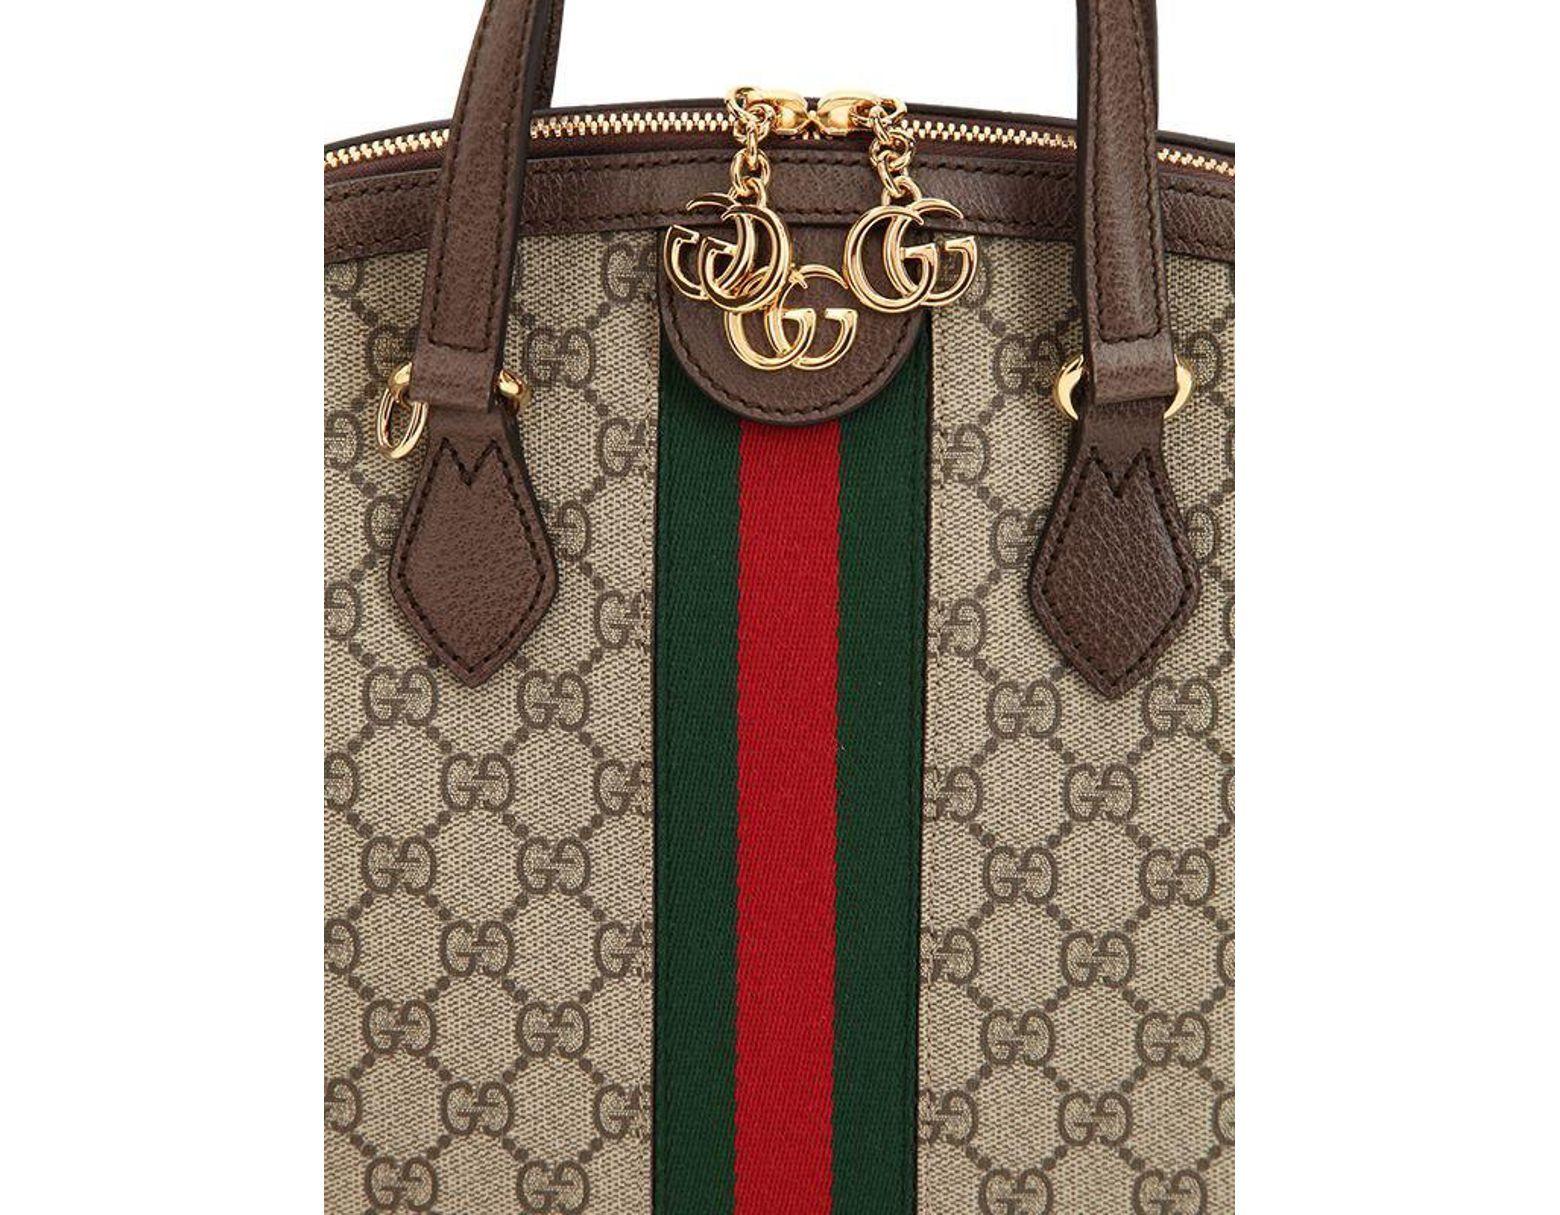 b96bb0139f4b Gucci Beige Ophidia GG Medium Top Handle Bag in Brown - Save 23% - Lyst